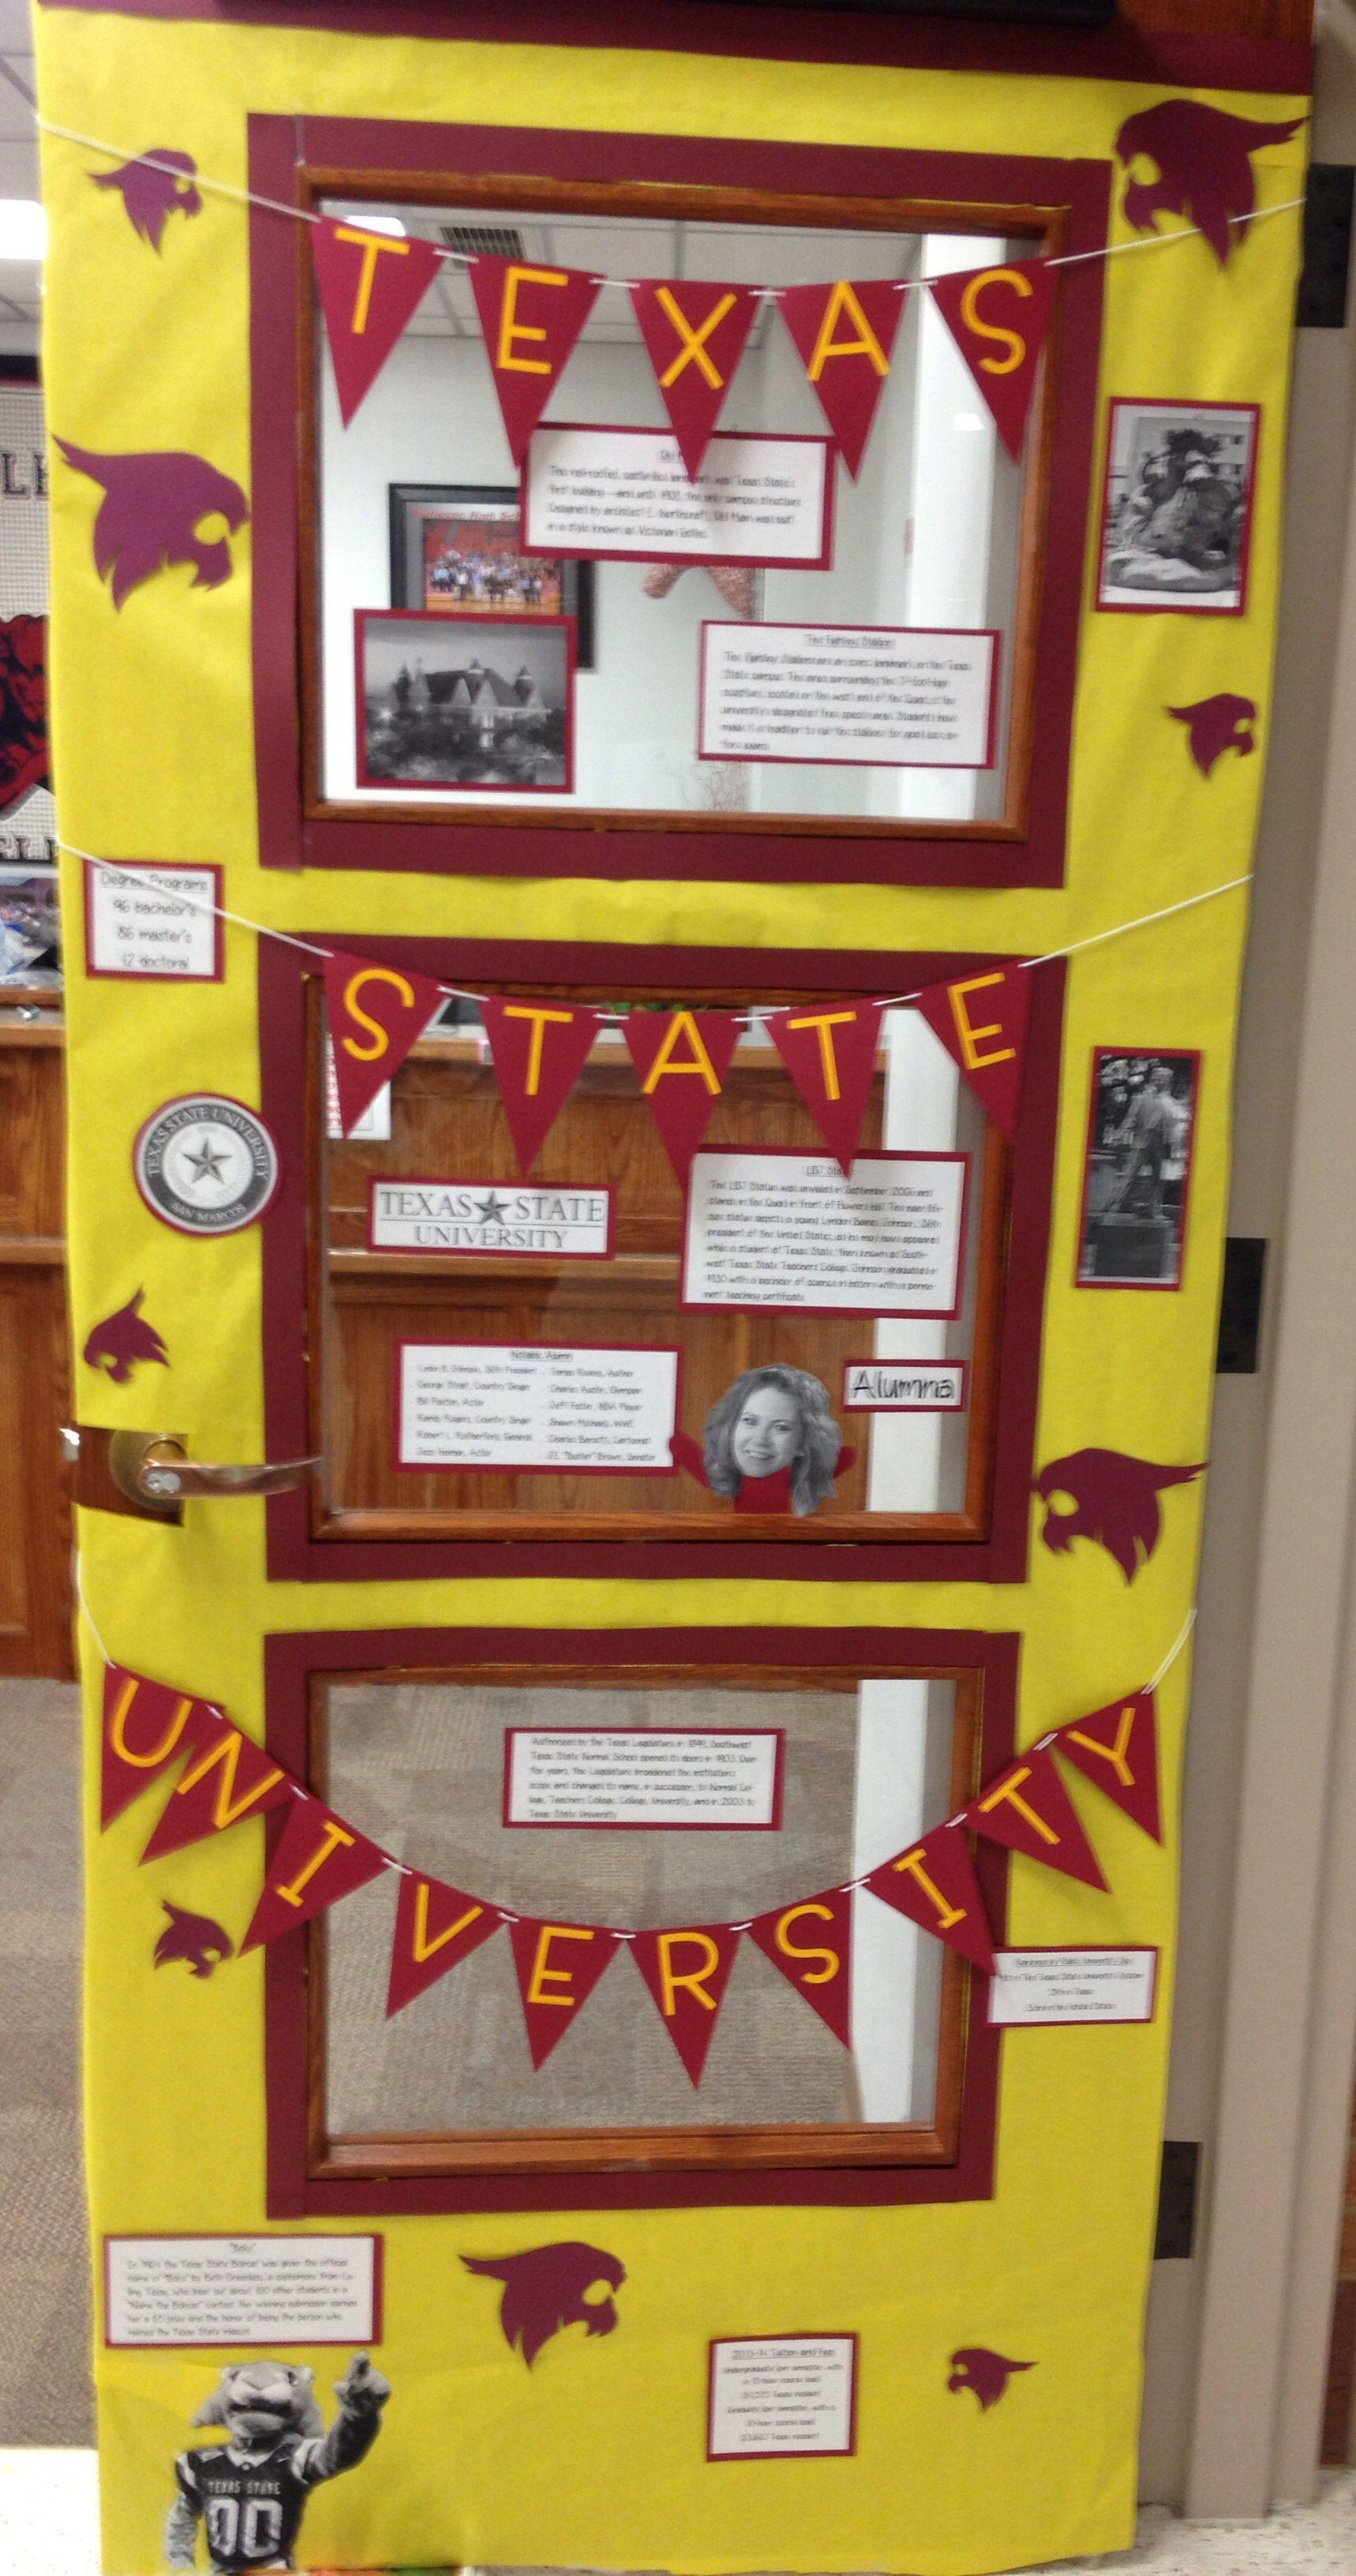 Texas State University door decoration. This week